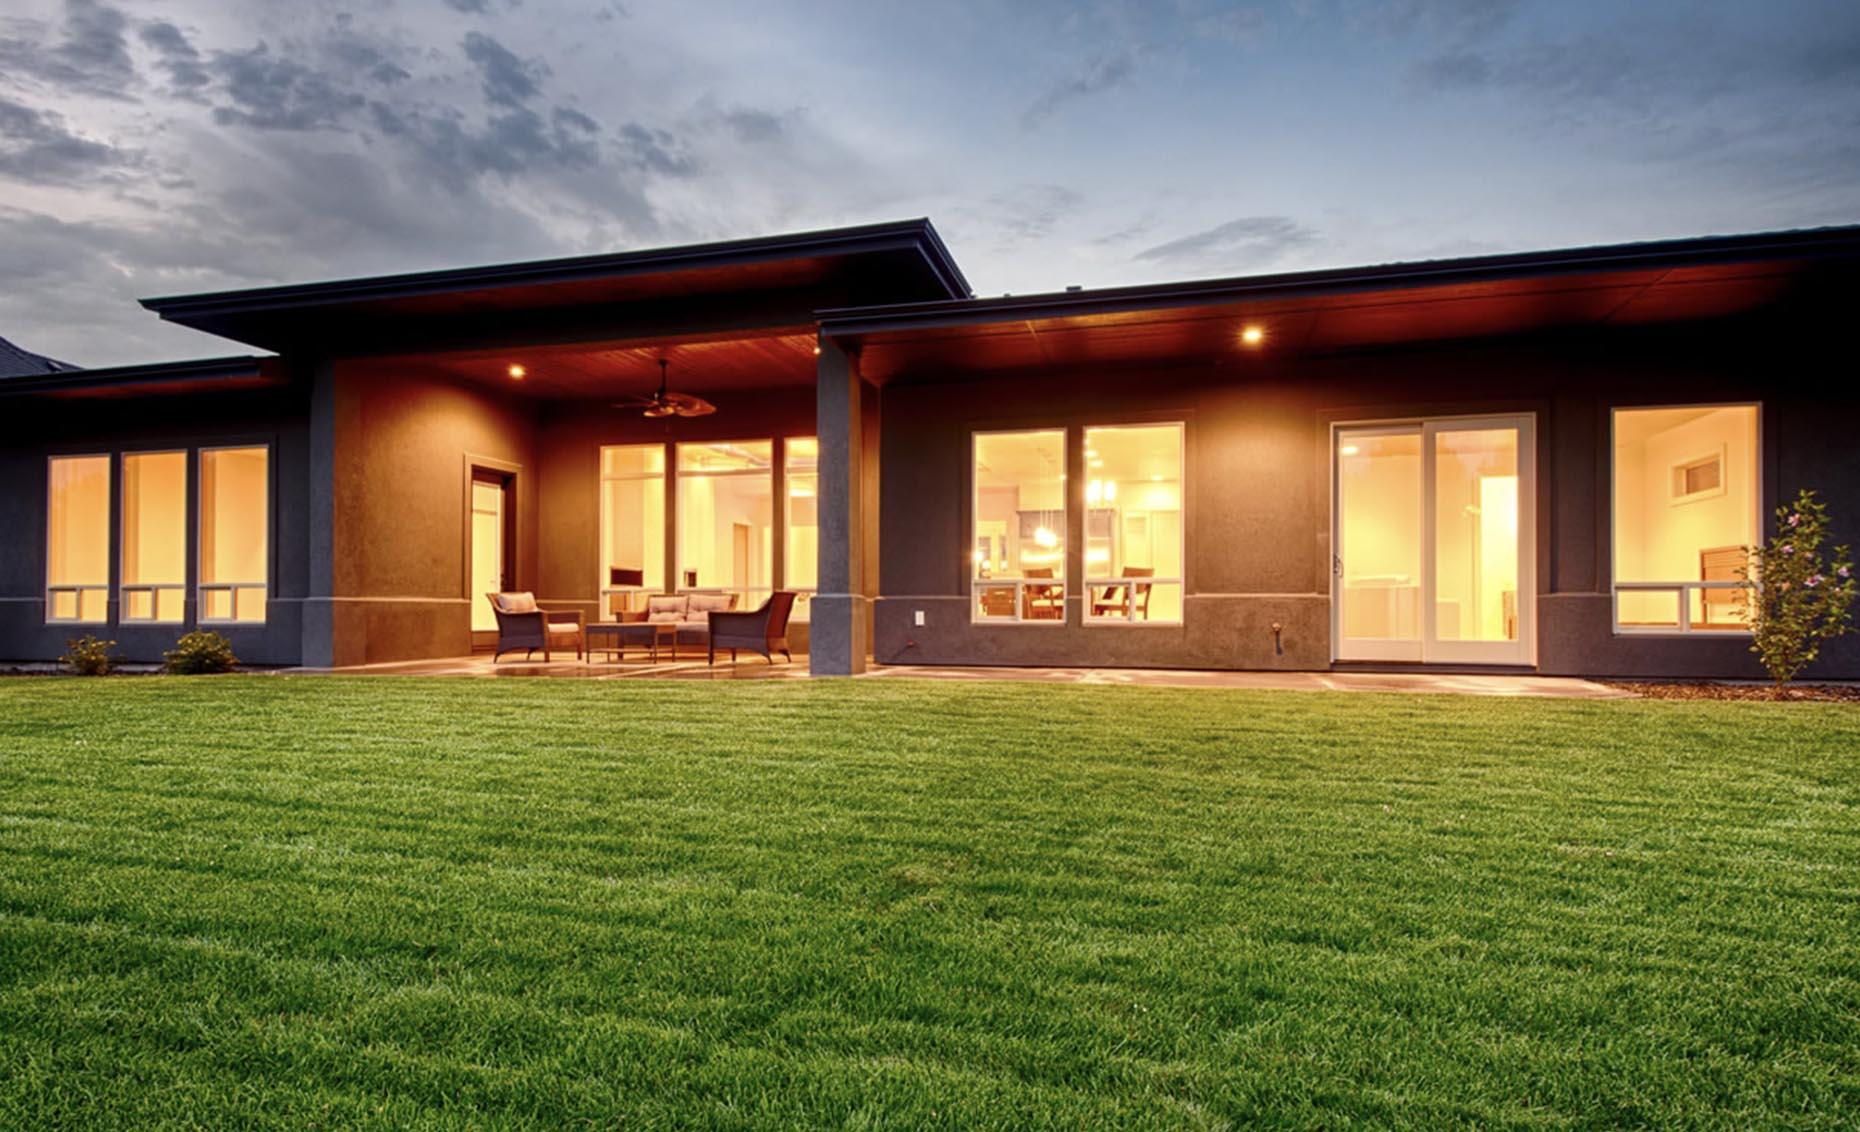 The Contemporary House Exterior Backyard View